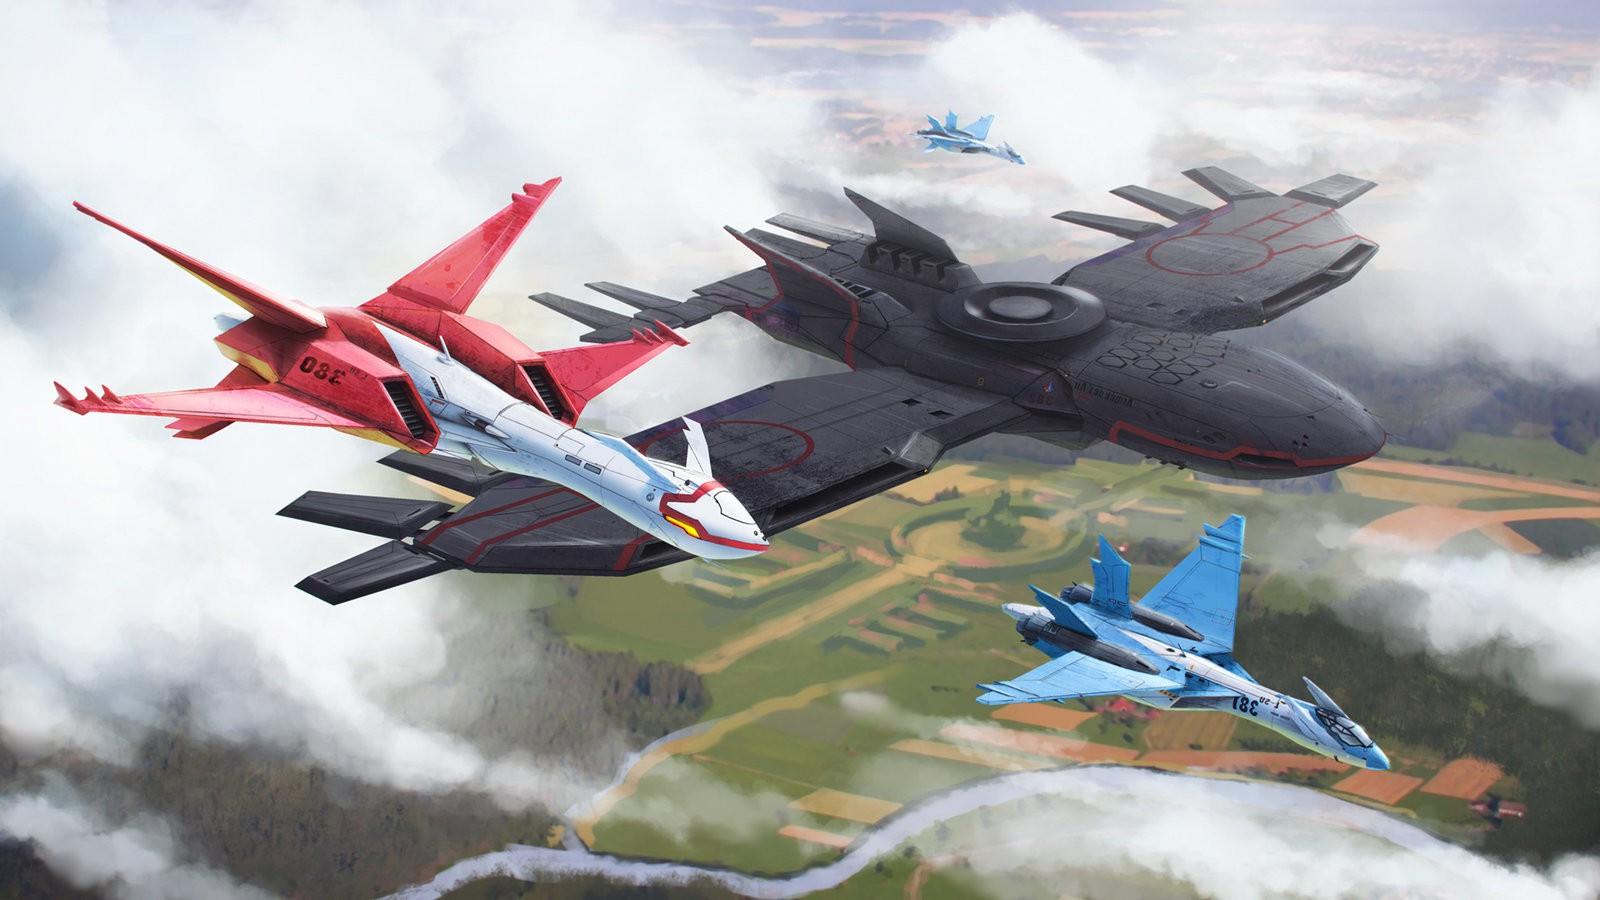 Latios Latias Jets Ace Combat Wallpapers HD Desktop 1600x900